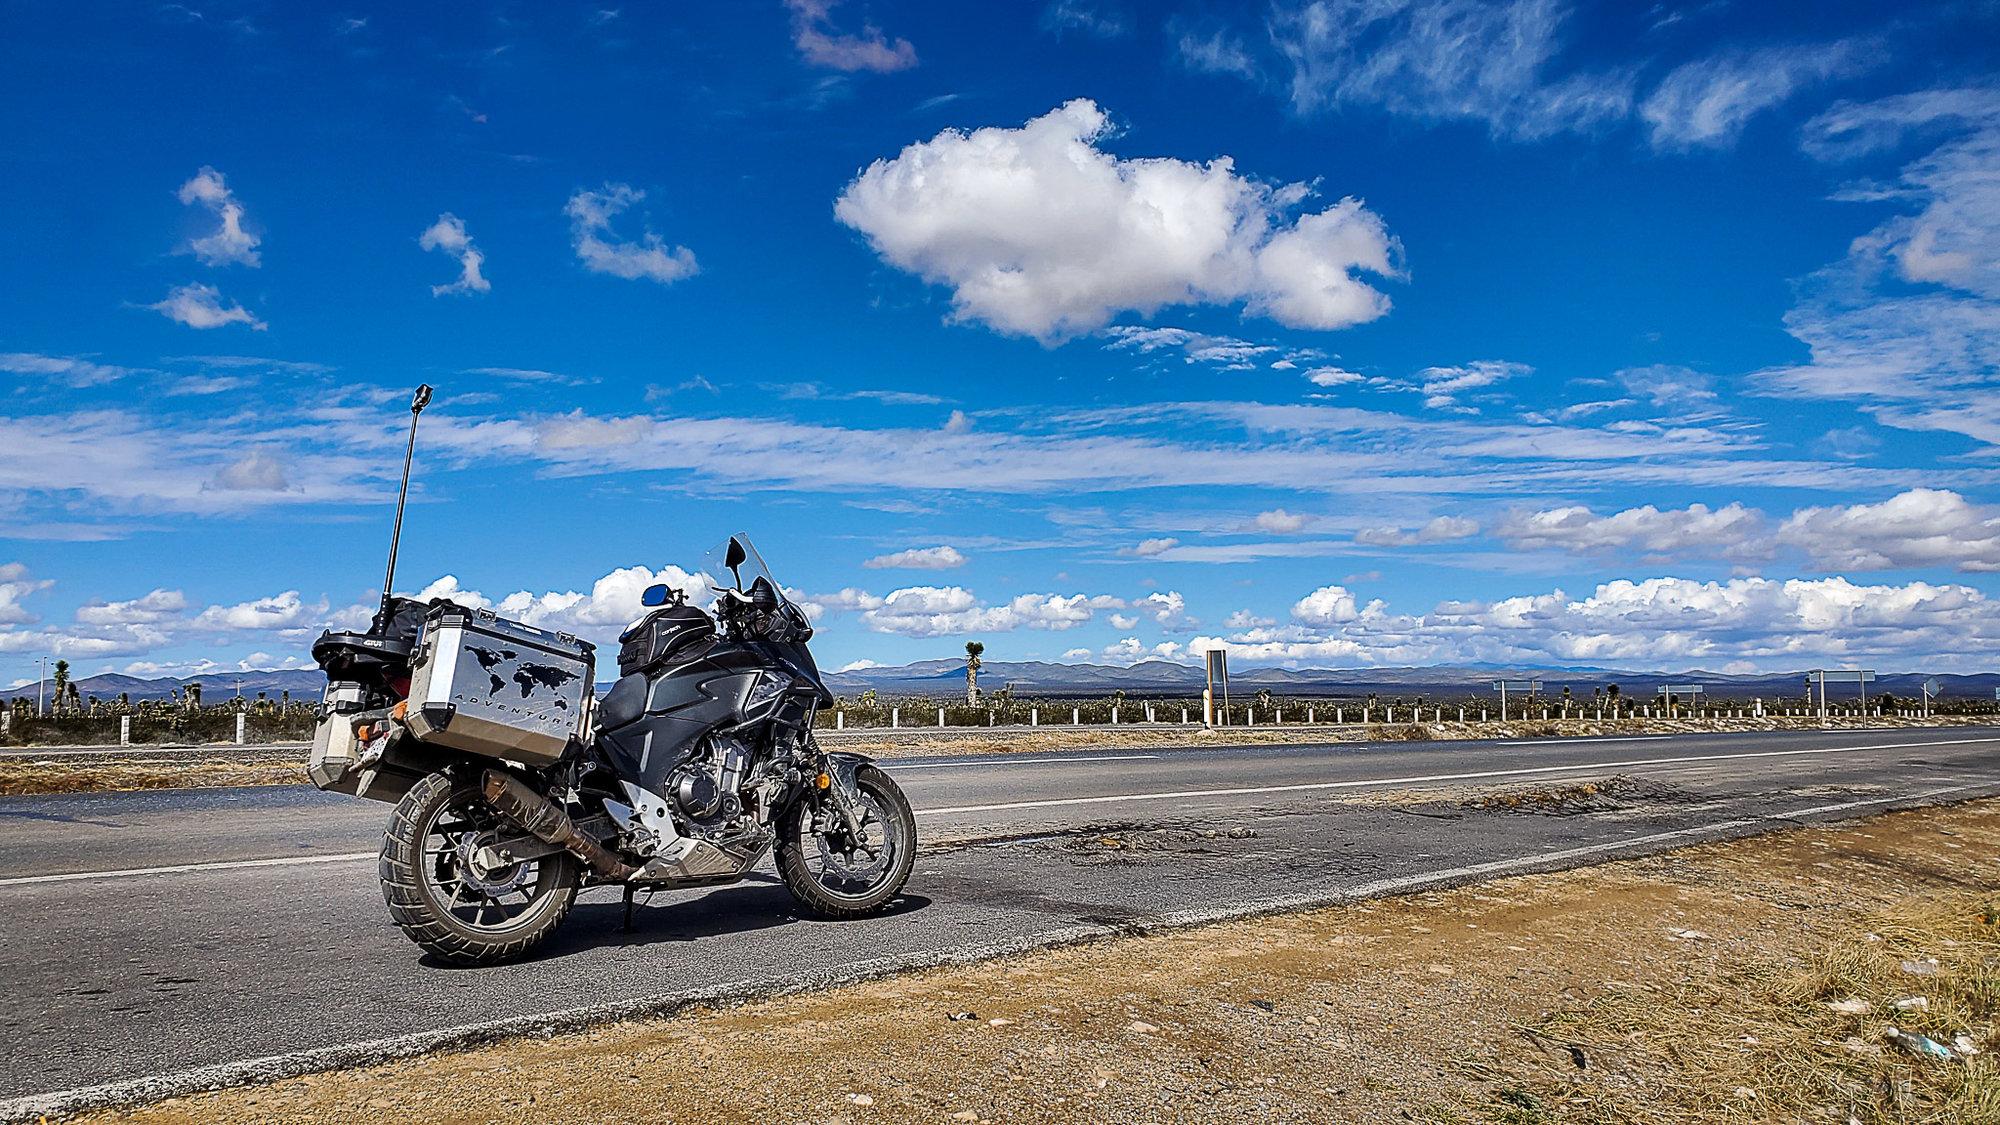 200114-Moto-Photo-Mexico-0445.jpg